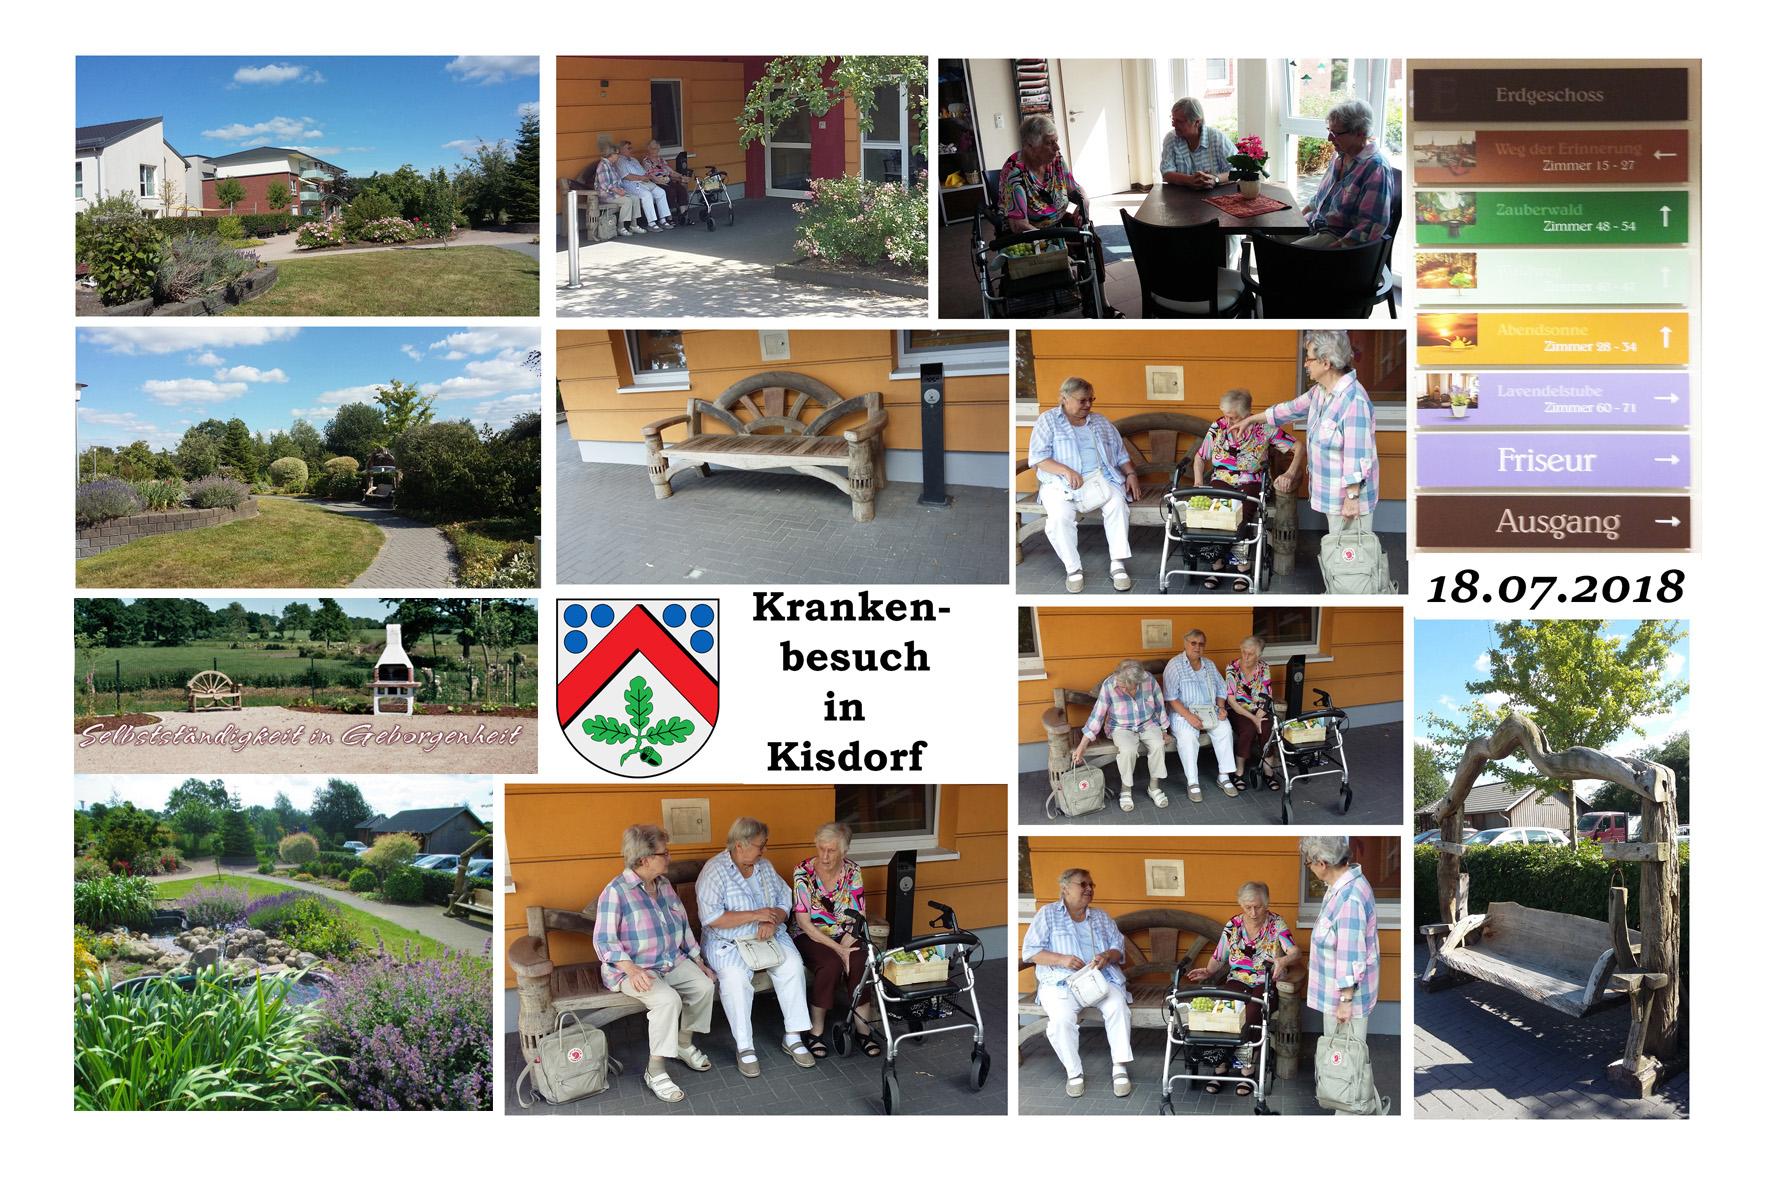 NeNo/Glashütte 2: Krankenbesuch in Kisdorf, 18.07.2018 (Fotos: Tom)